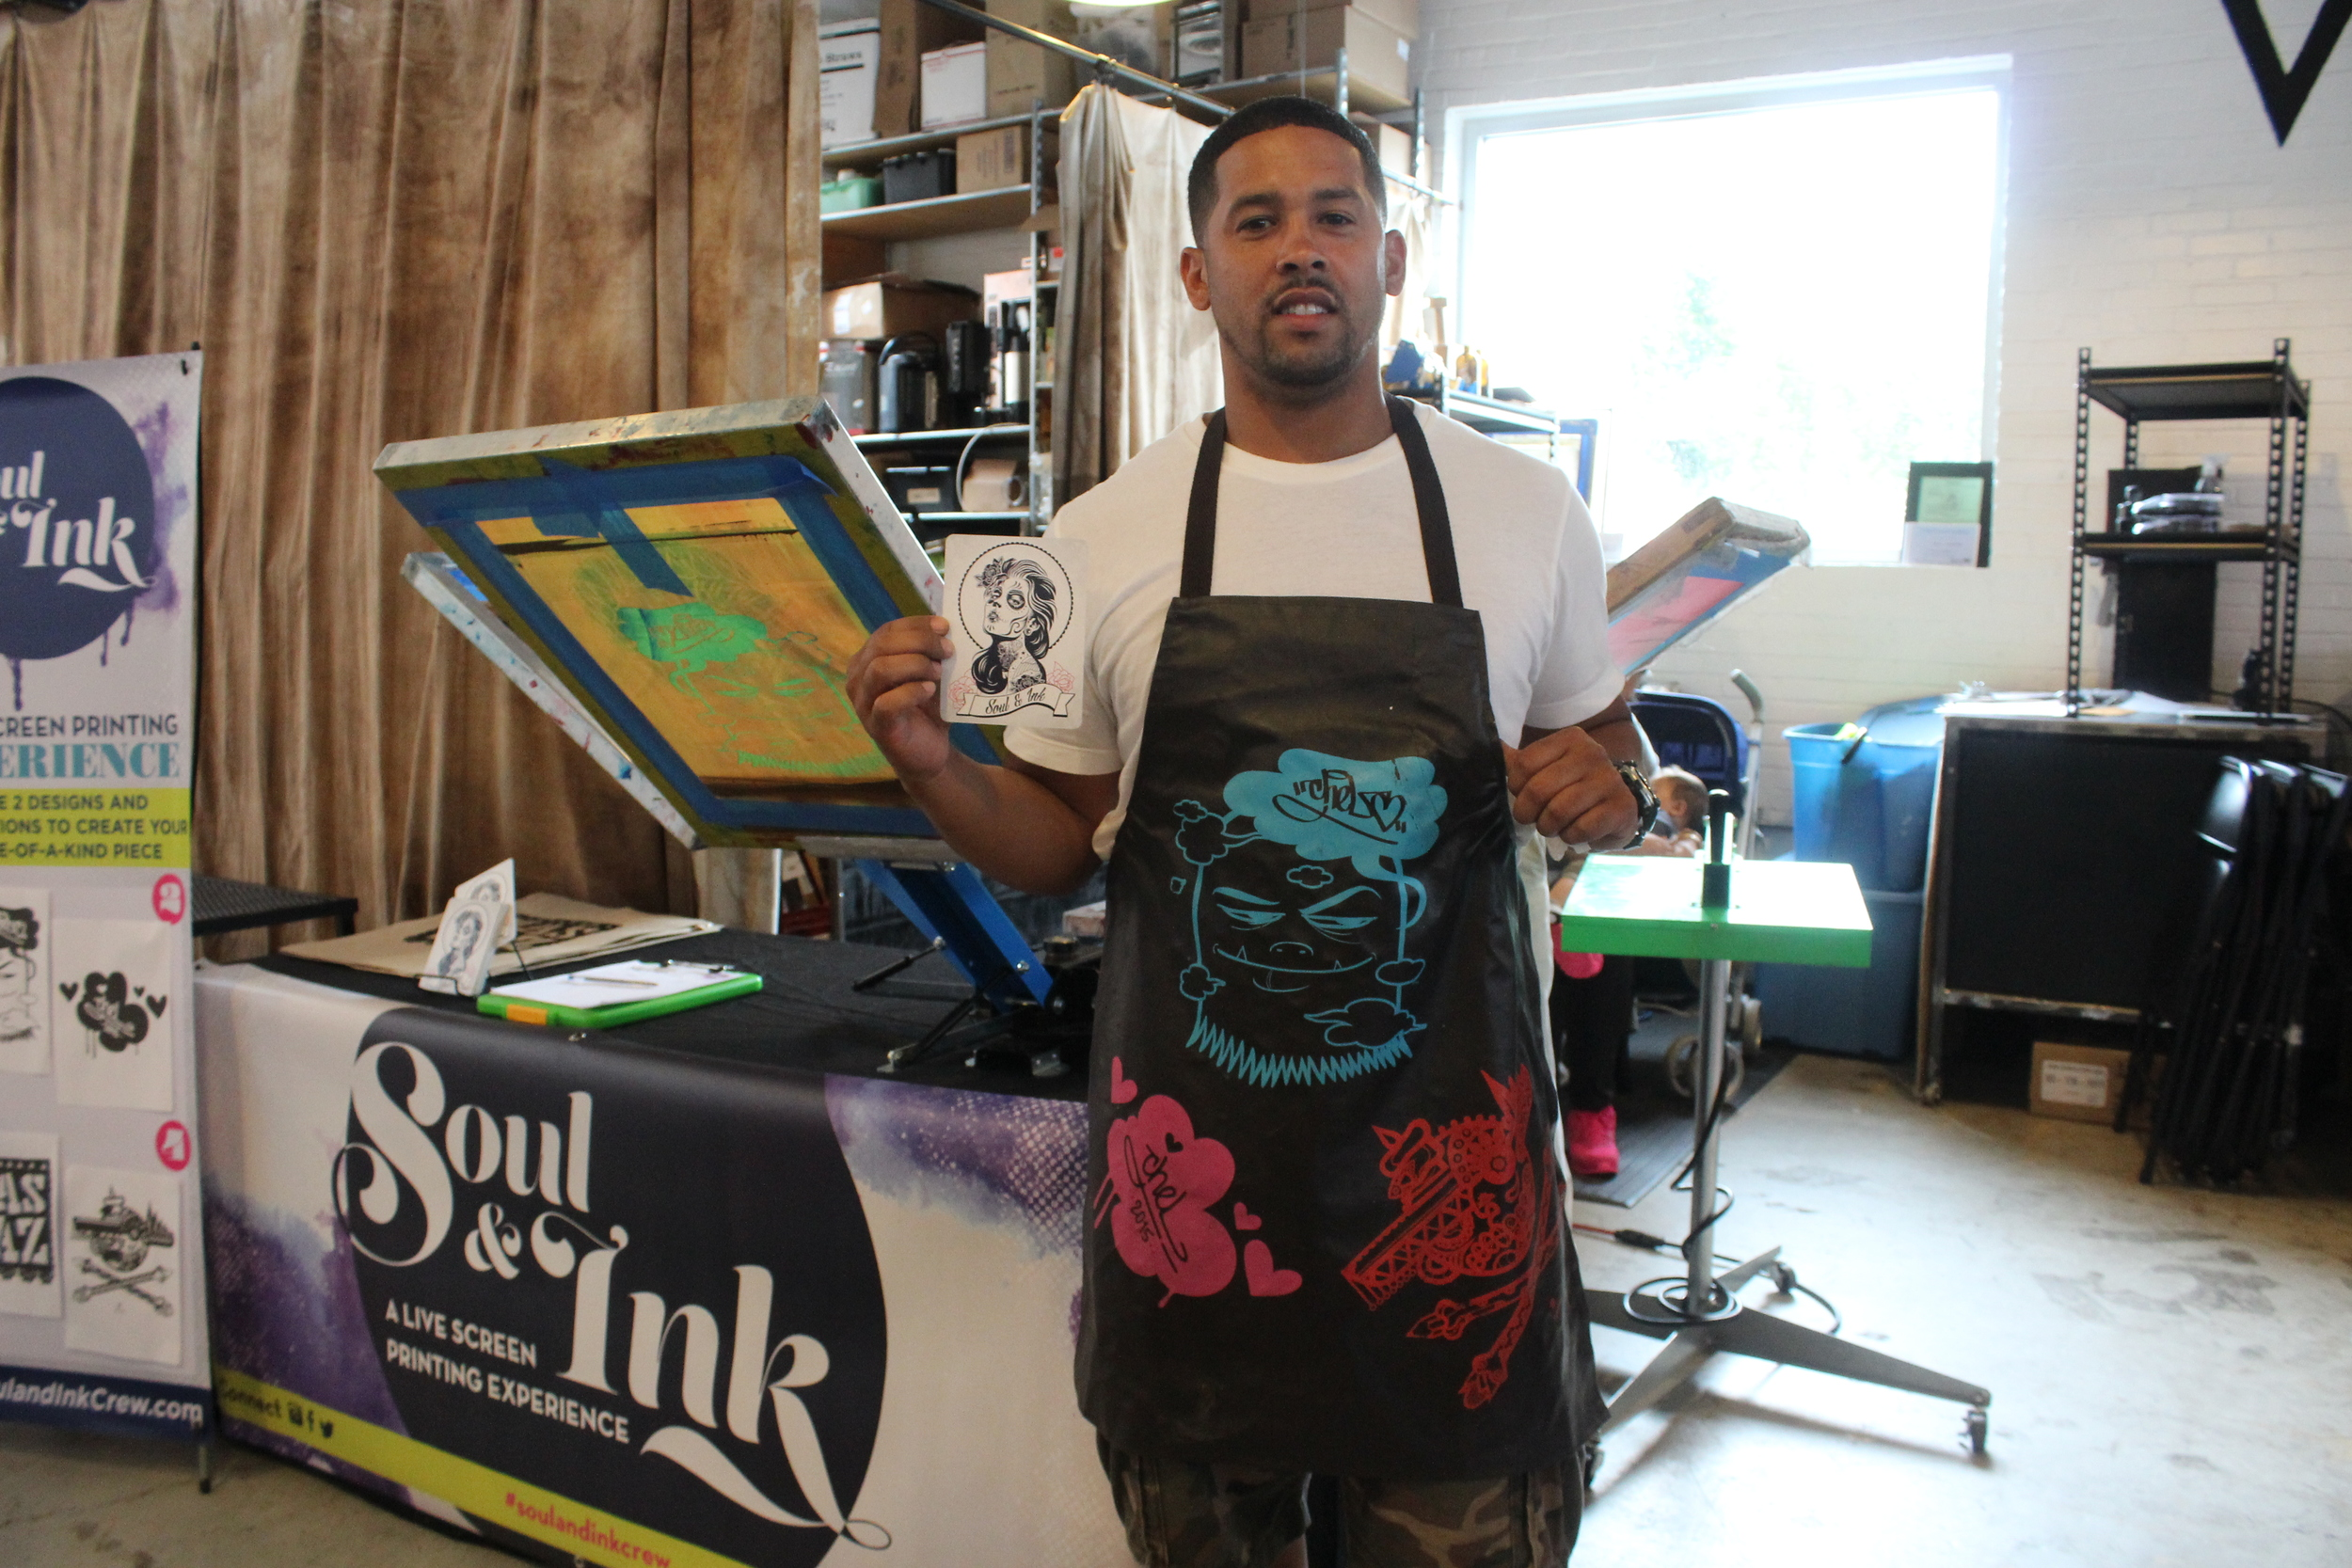 Moses Rivera, Creative Director of BeMoShe, representing Soul & Ink at the SoHy Skate Show